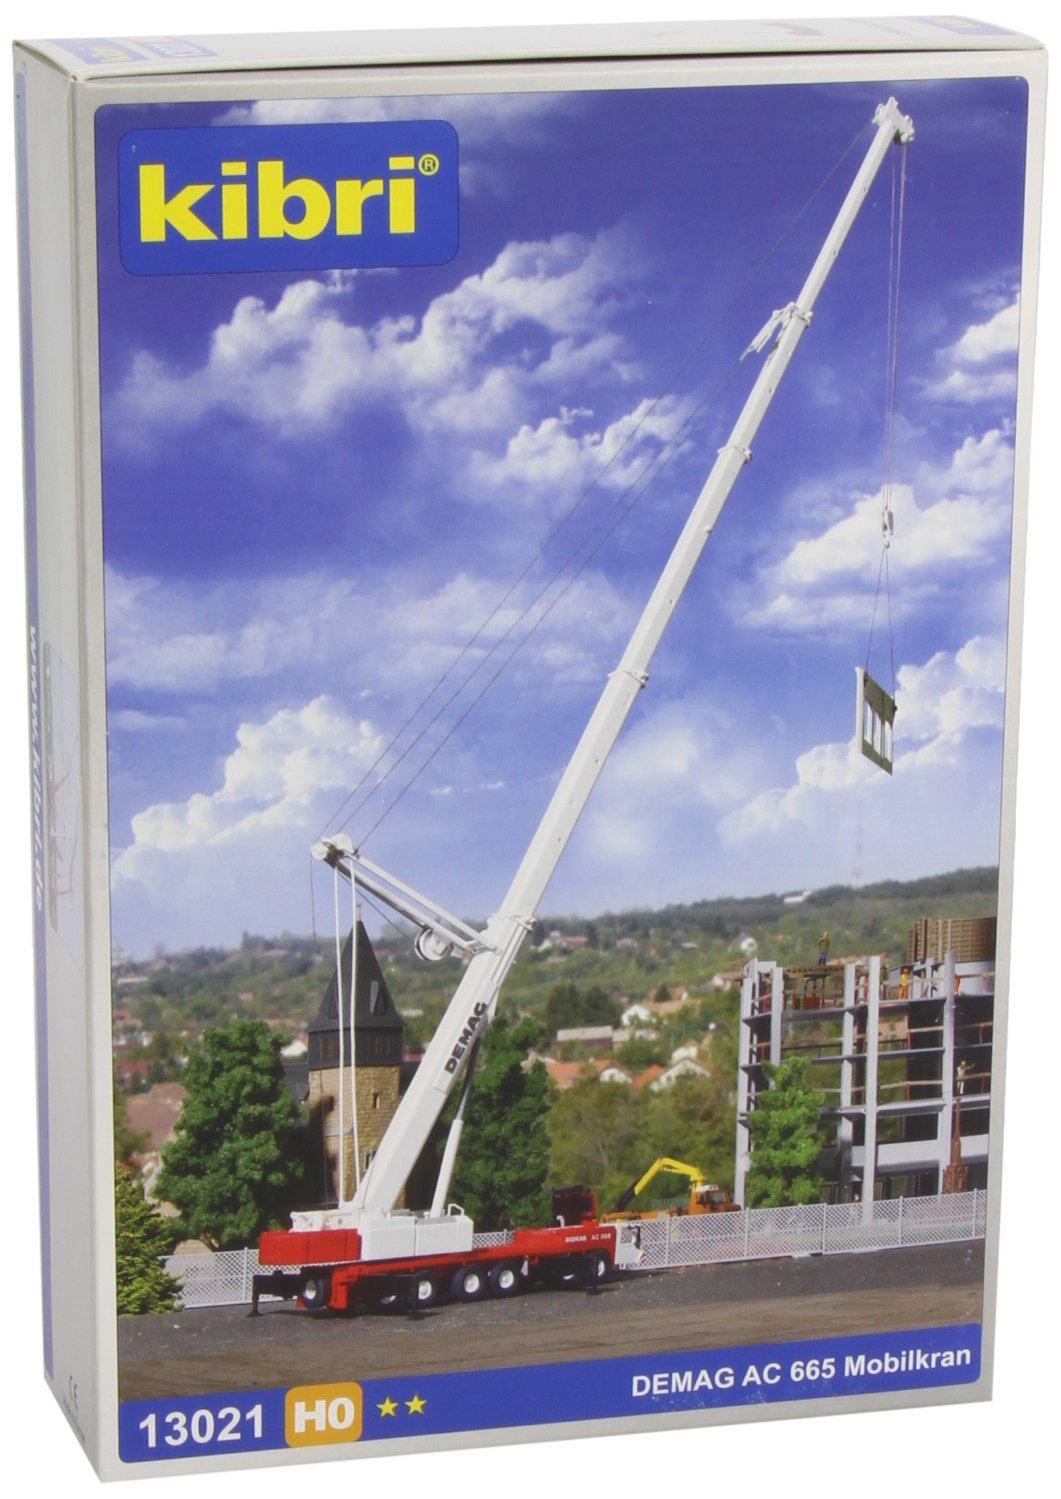 Kibri 13040 Breuer /& Wasel Crane Kit